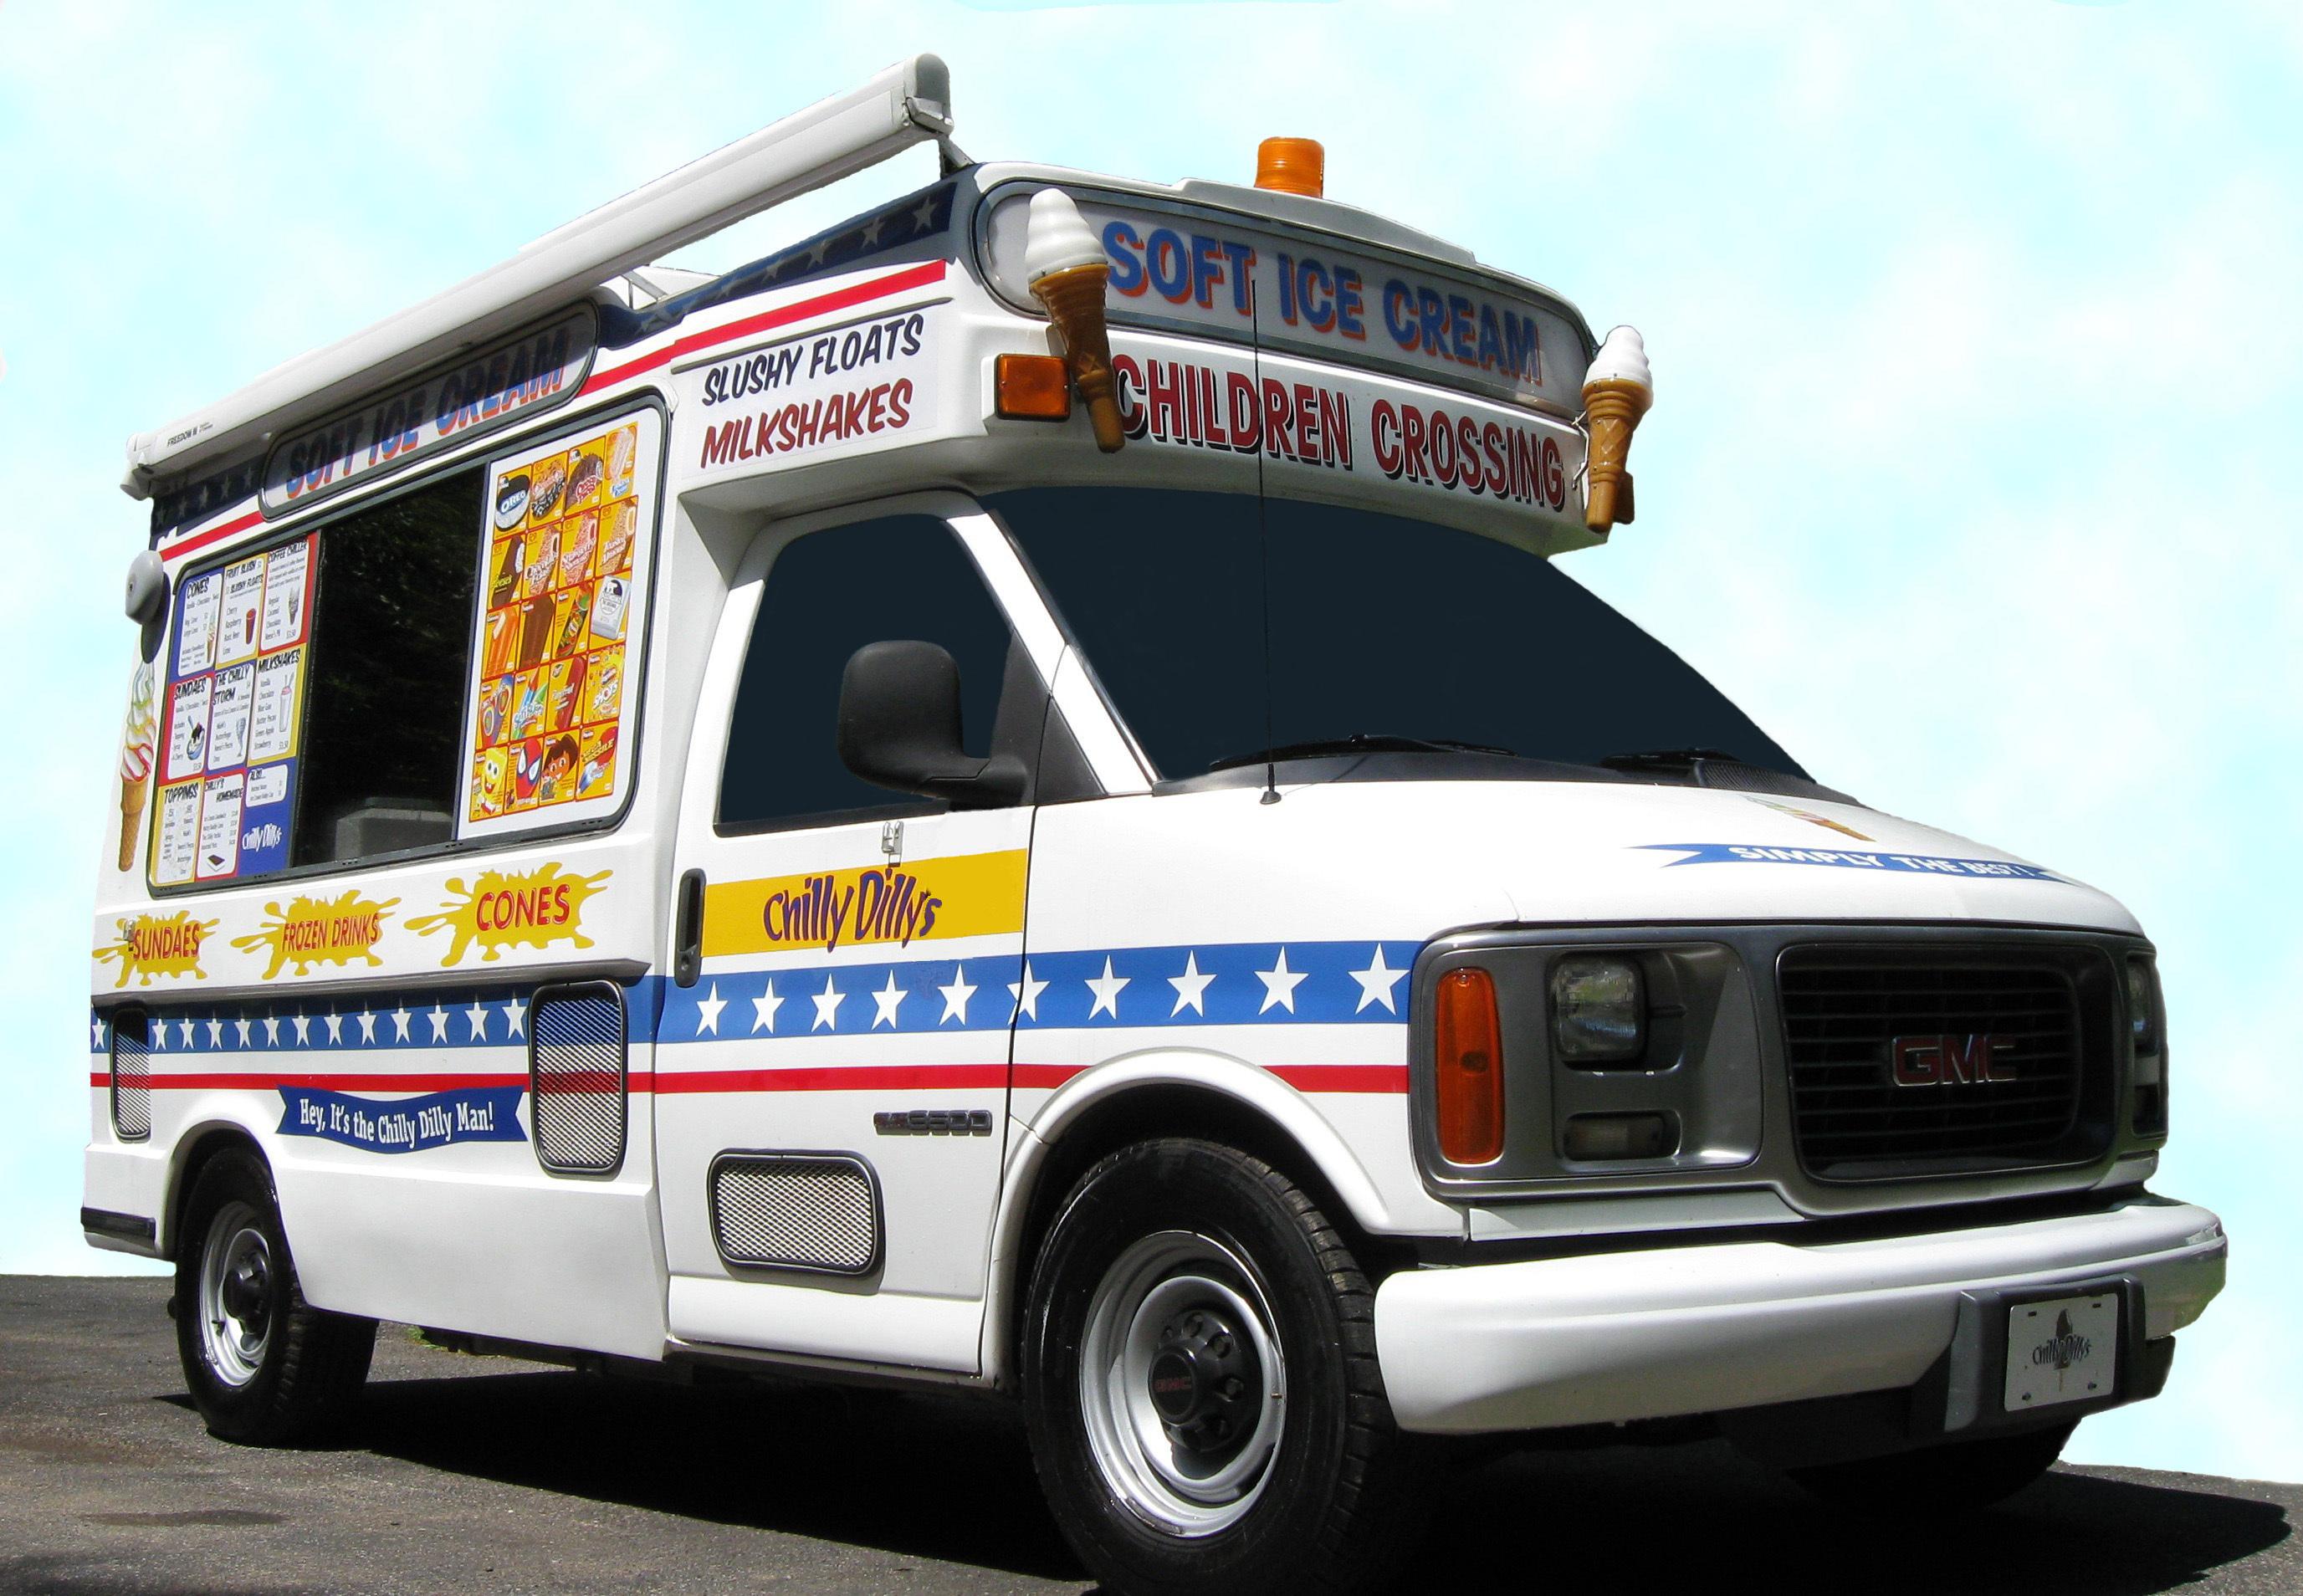 Dessert, Ice, Cream, Truck